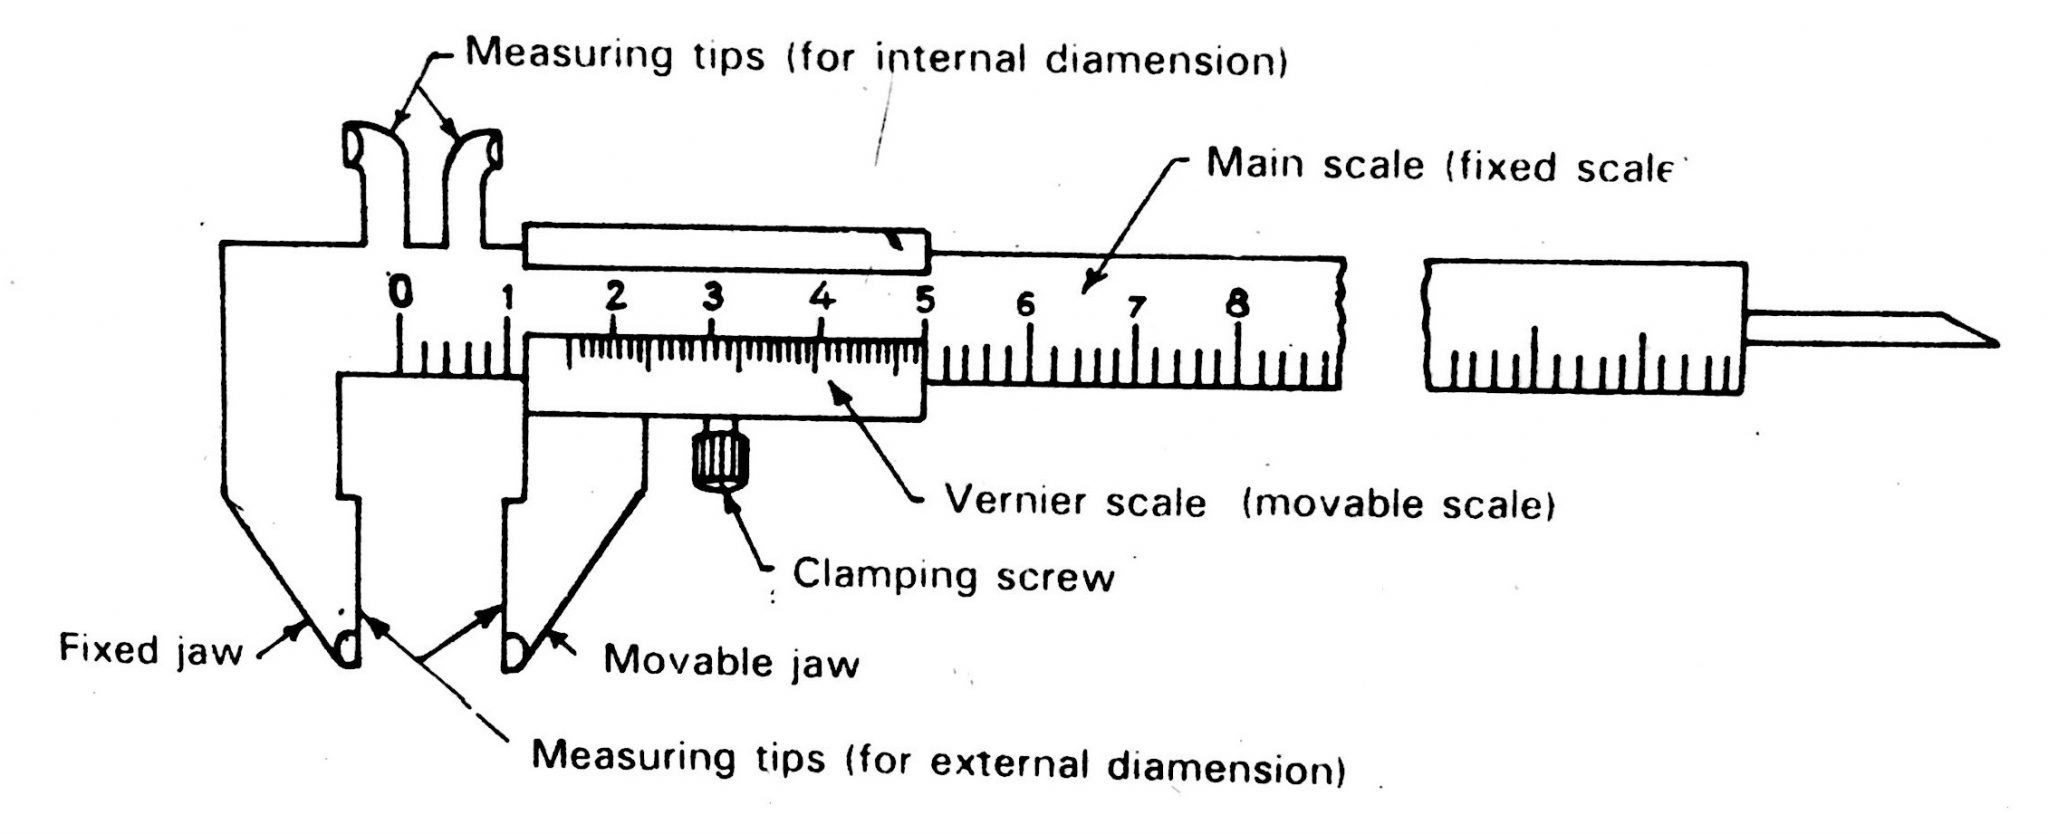 vernier calliper diagram working principle metrology diagram full diagram of vernier caliper full diagram of vernier caliper [ 2048 x 834 Pixel ]